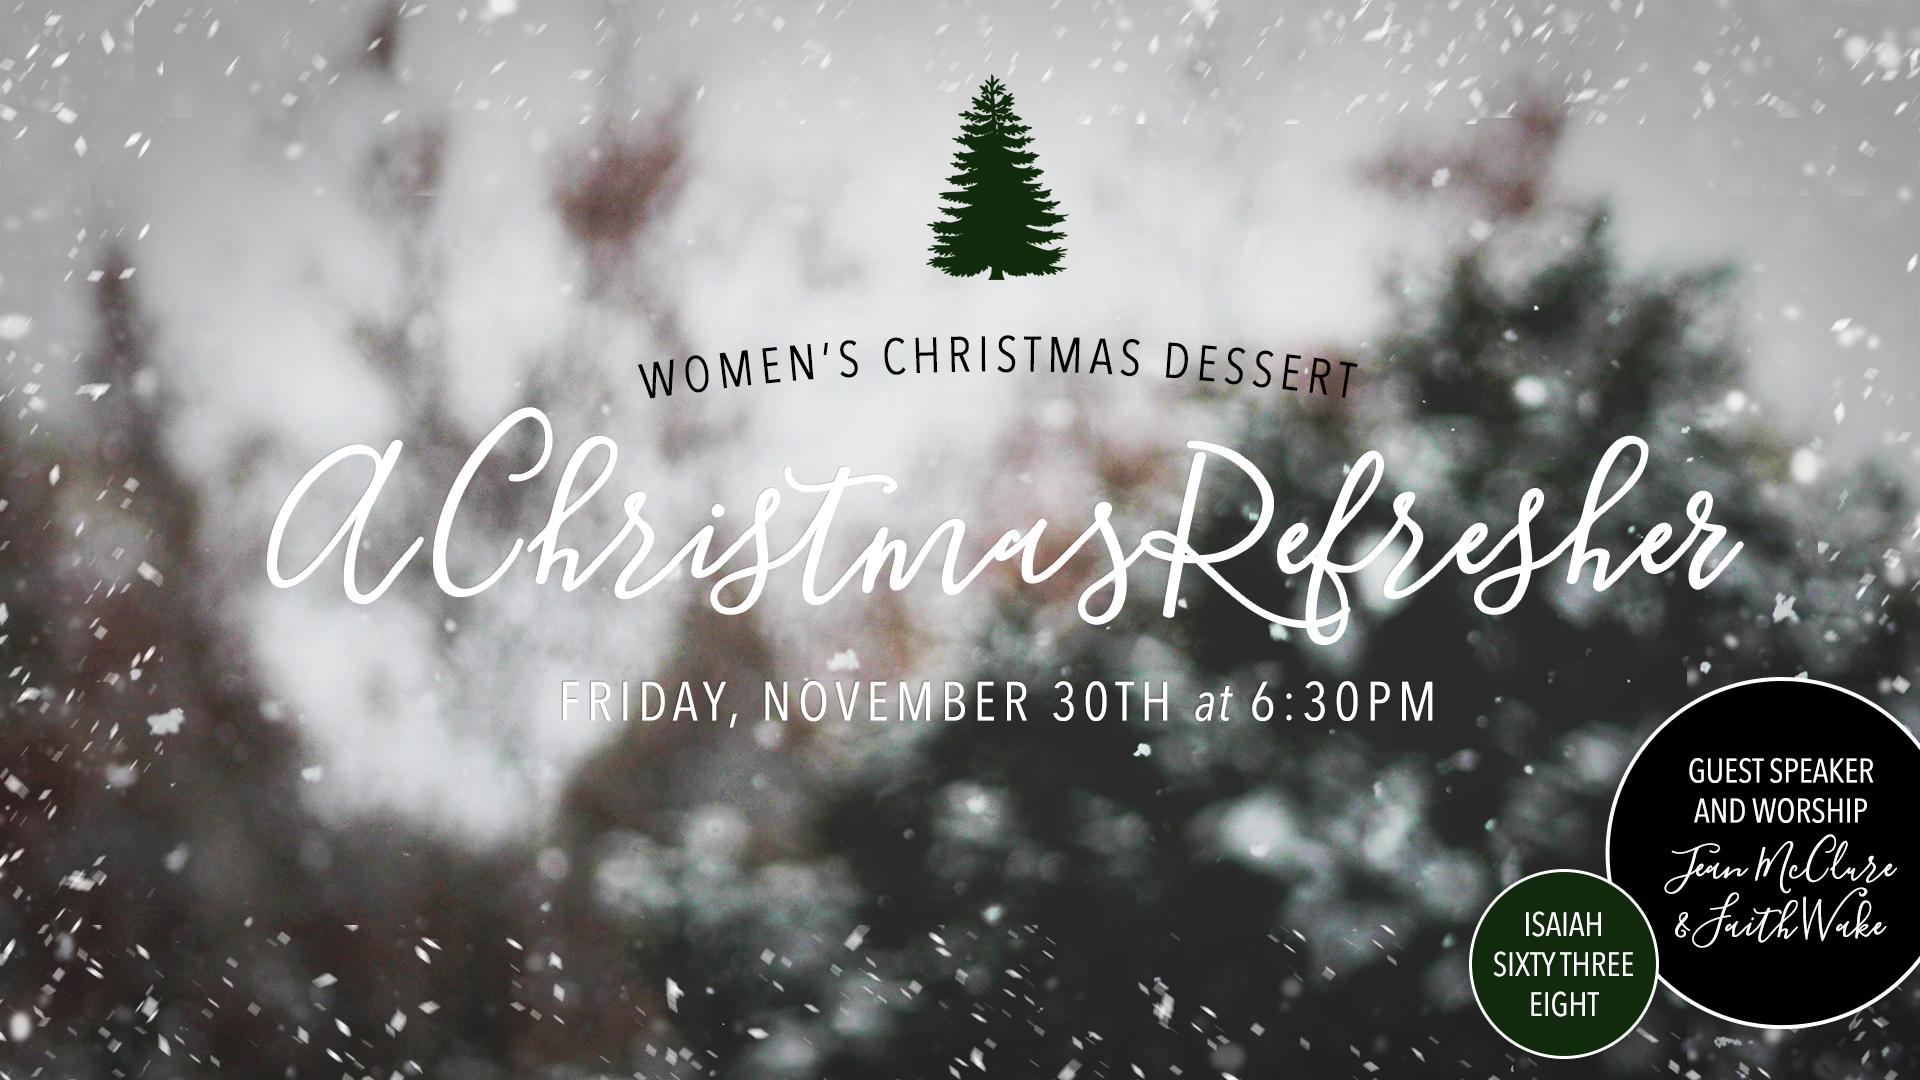 Women's Christmas Dessert